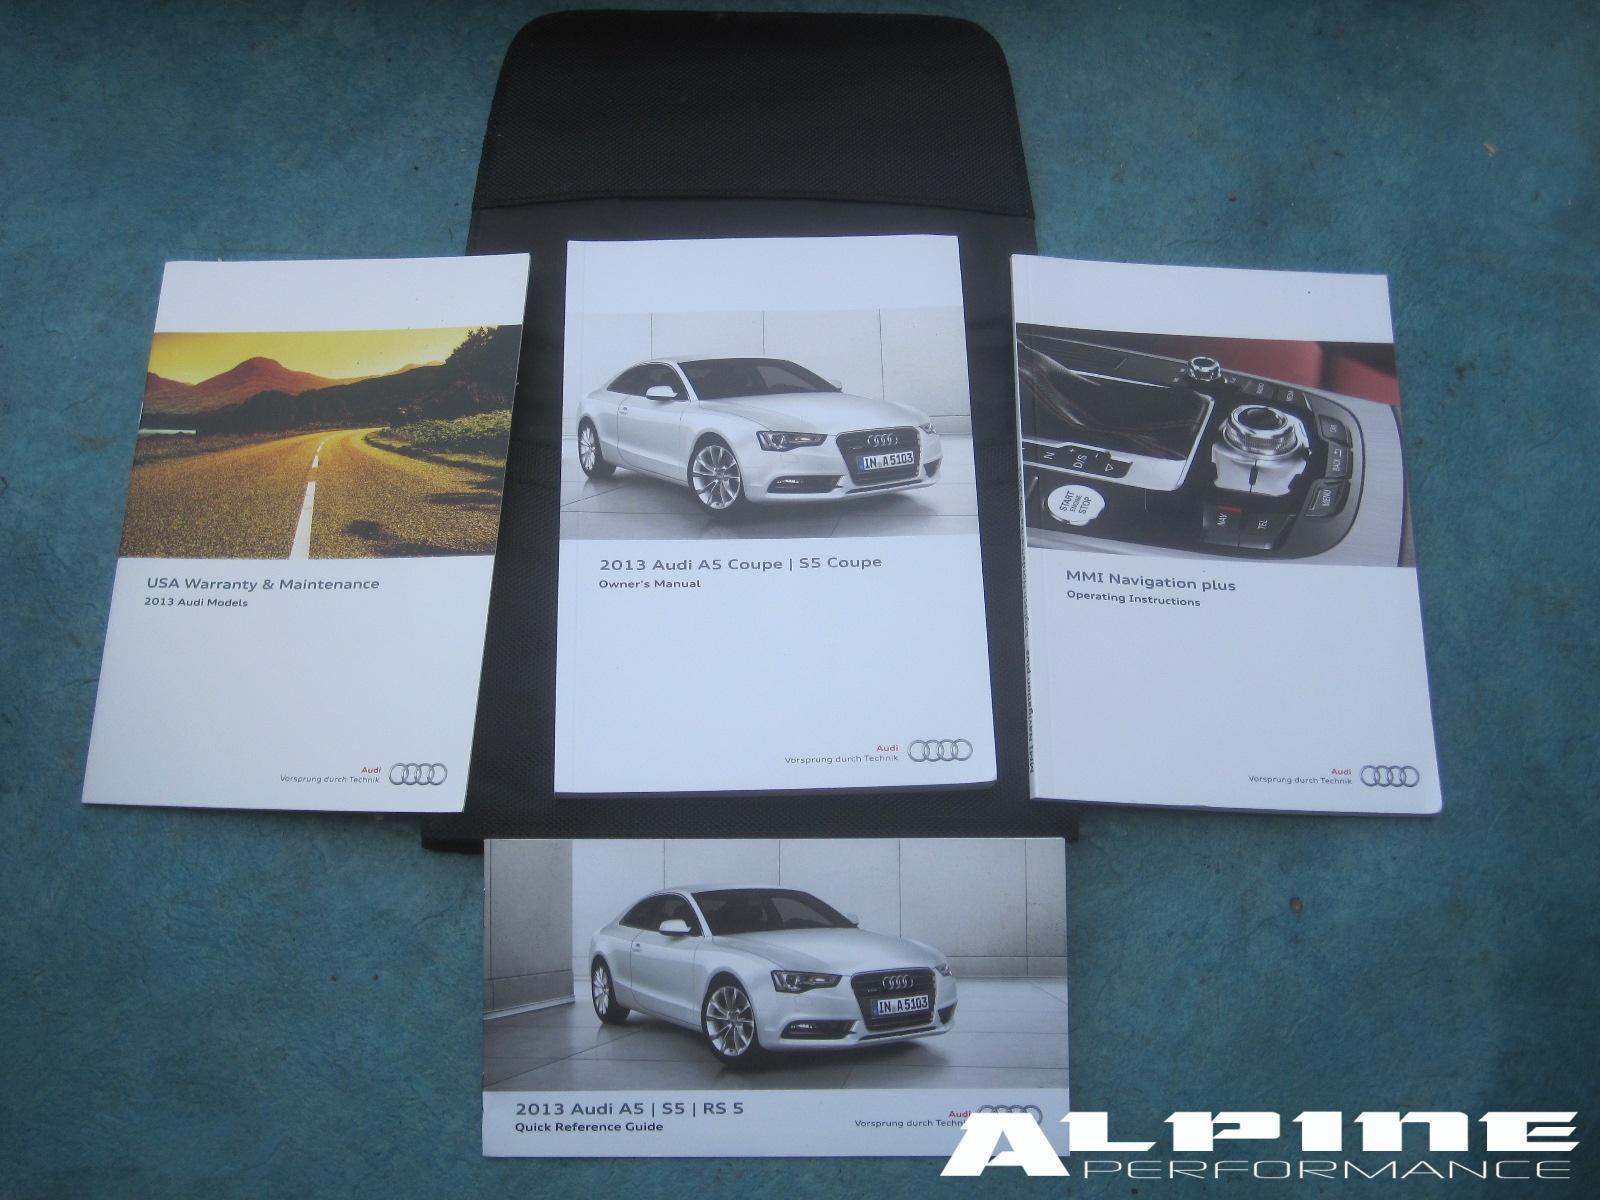 origianal audi a5 s5 coupe owners manual set books case manuals mmi rh alpinediscountparts com audi mmi manual 2017 manuel mmi audi a4